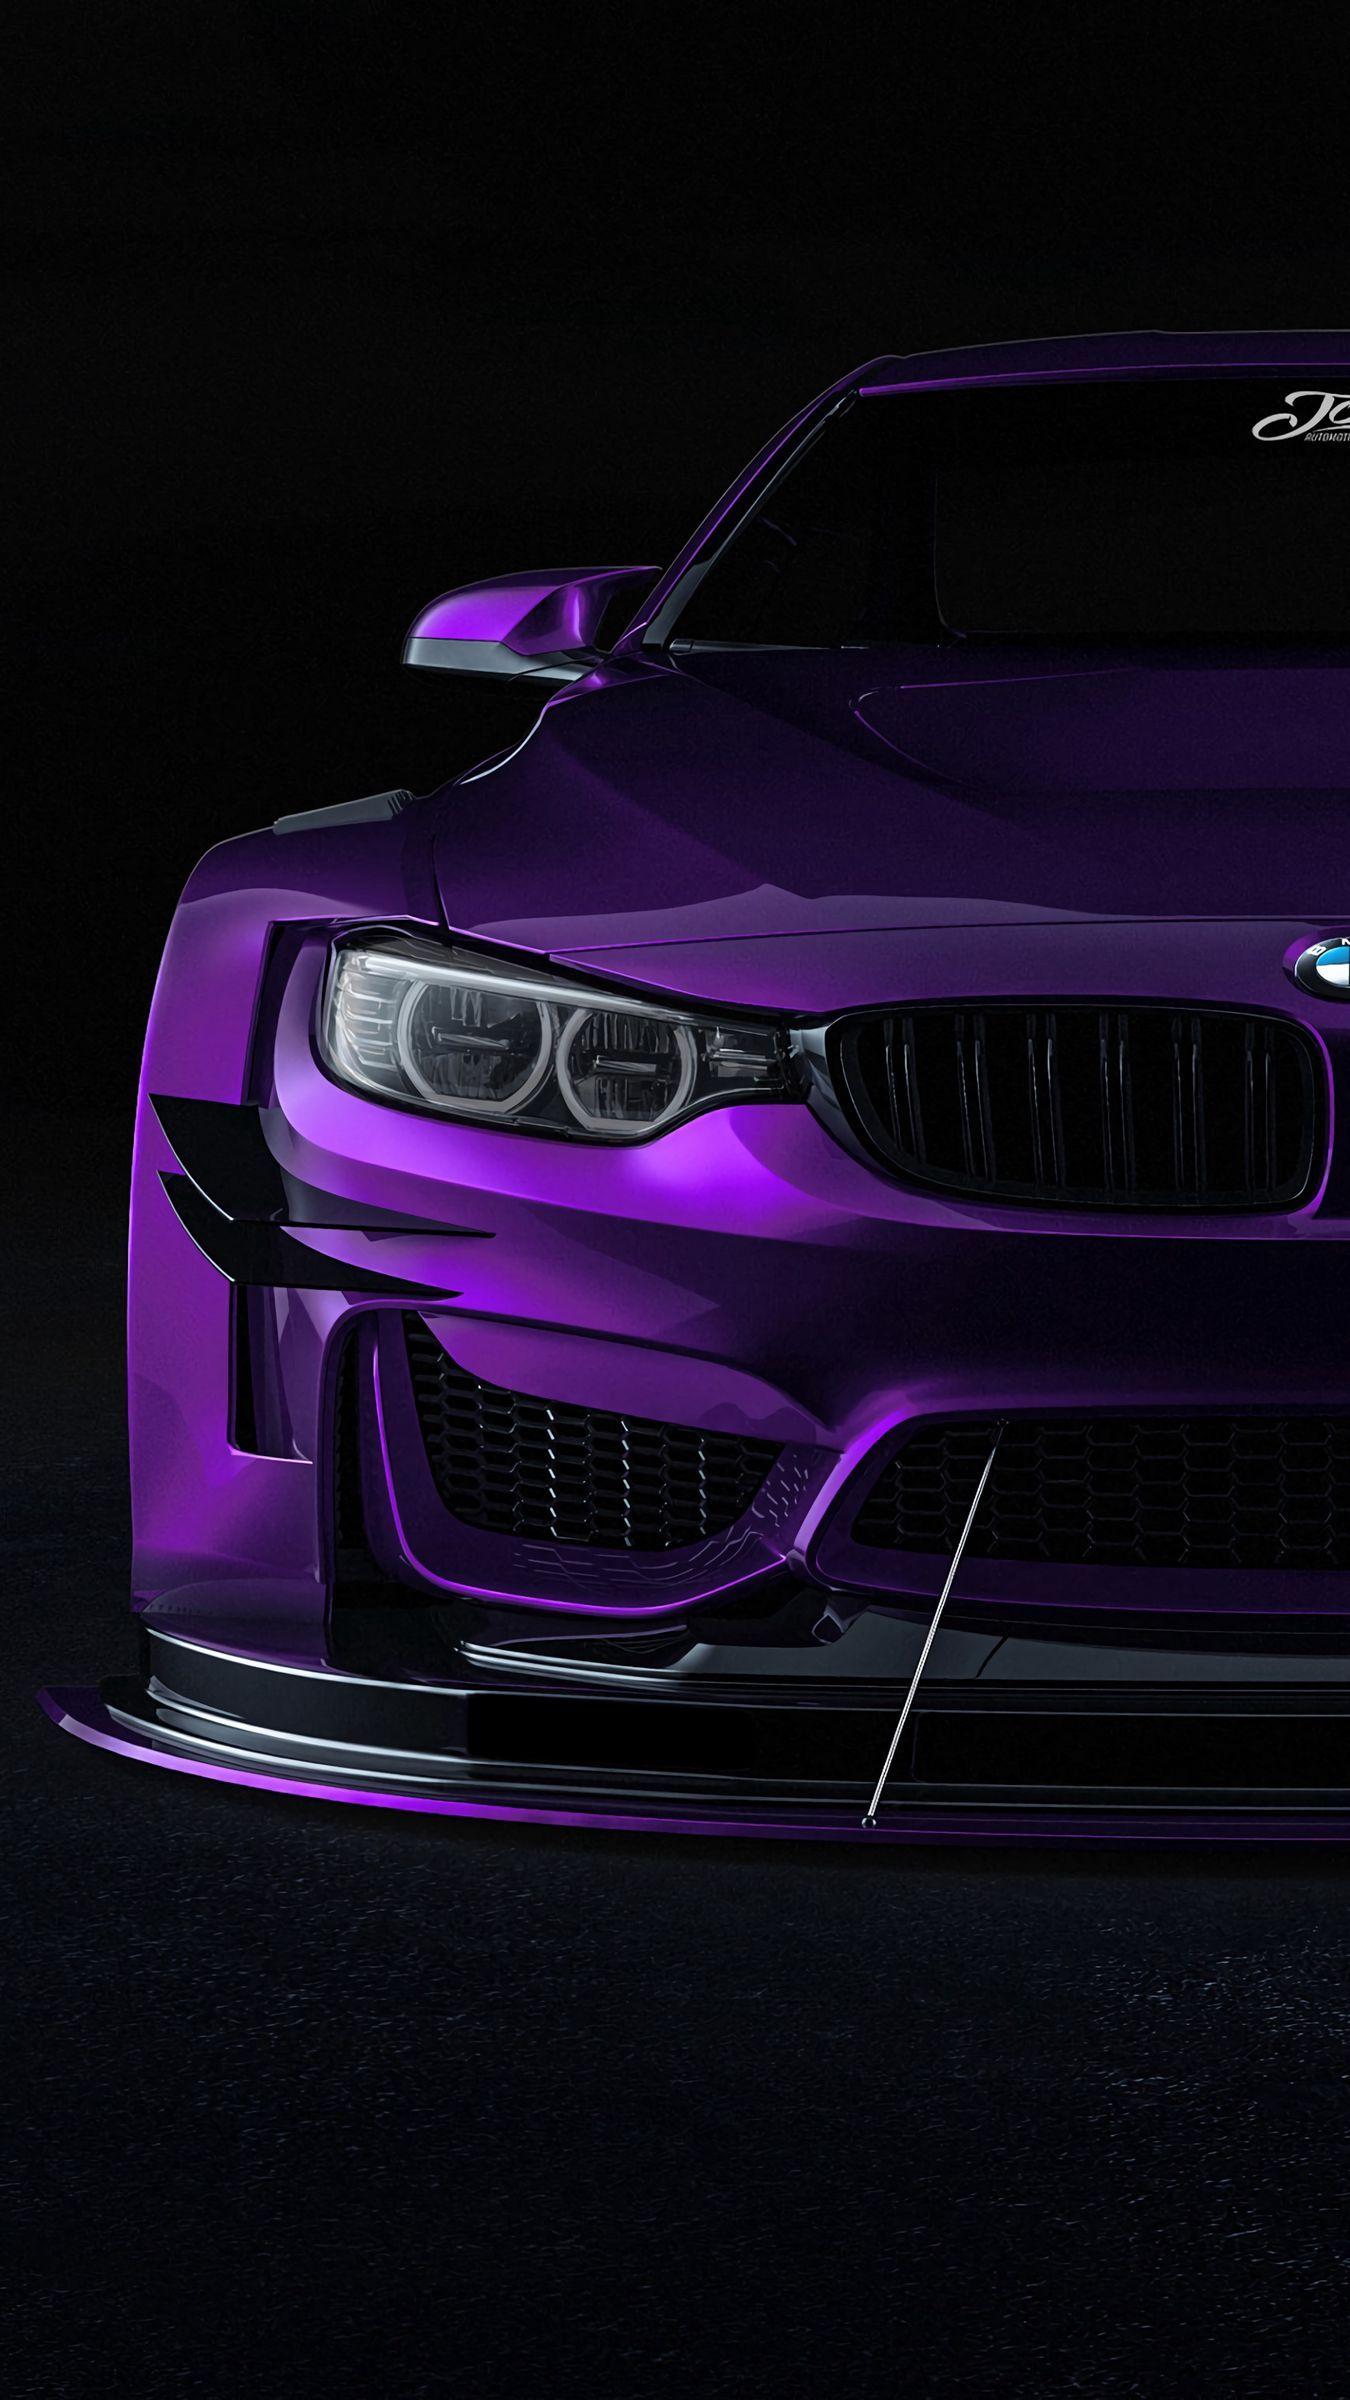 Download 1350x2400 Bmw Car Sportscar Purple Front View Wallpaper In 2021 Bmw Car Wallpapers Bmw Car